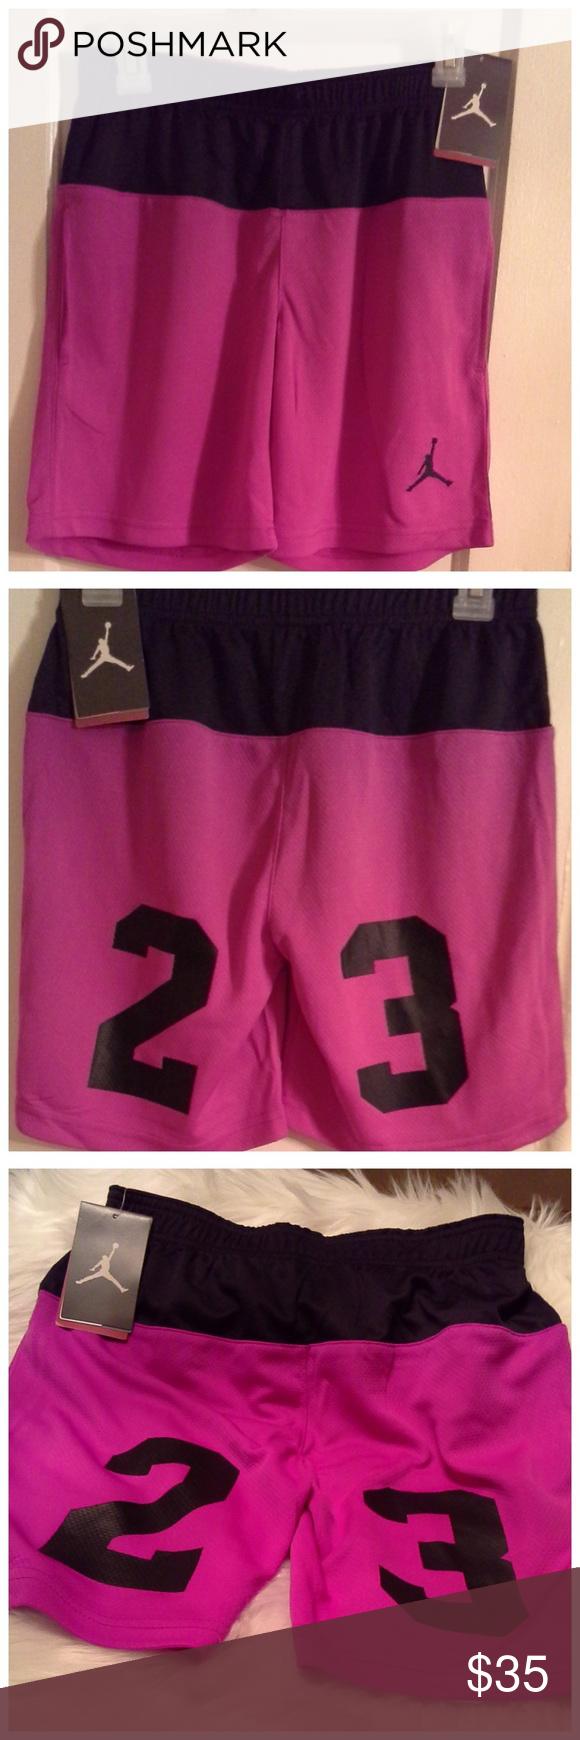 b47f0a80d931 Nike Air Jordan Jumpman Big Girls Shorts NWT Nike Air Jordan Jumpman Big  Girls Black   Pink 23 Basketball Sport Shorts. White Air Jordan flying  Jumpman logo ...